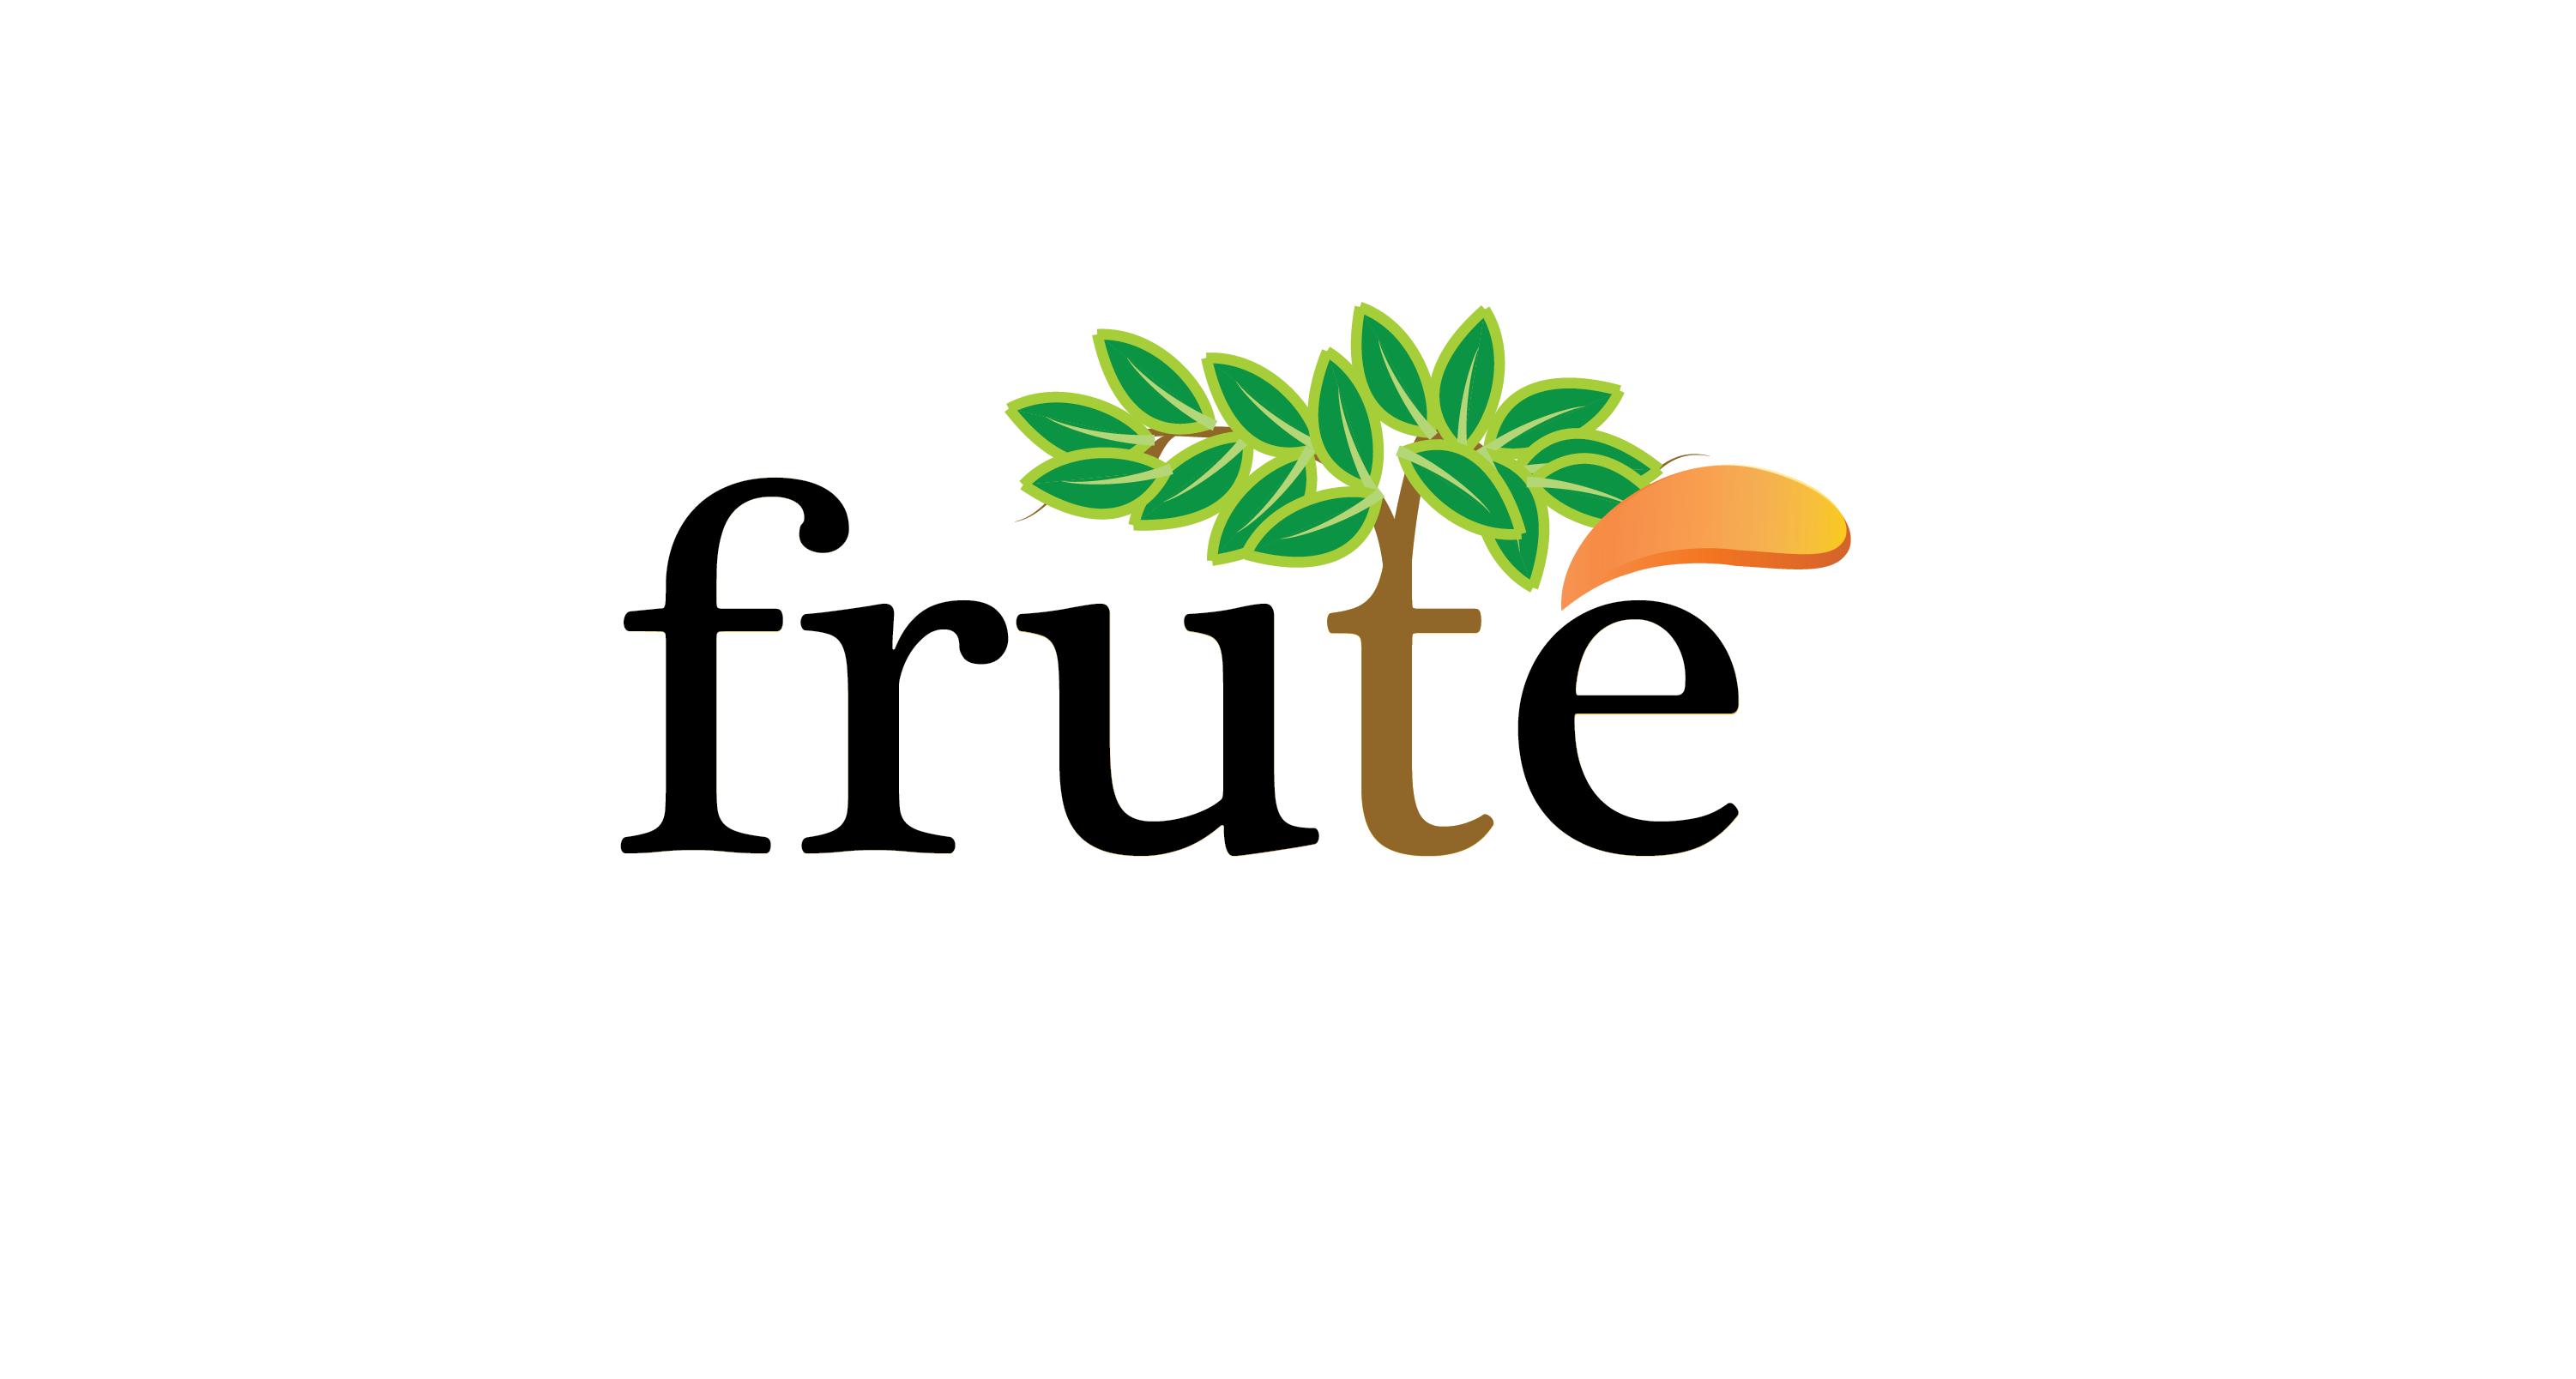 Logo Design by Tim Holley - Entry No. 69 in the Logo Design Contest Imaginative Logo Design for Fruté.